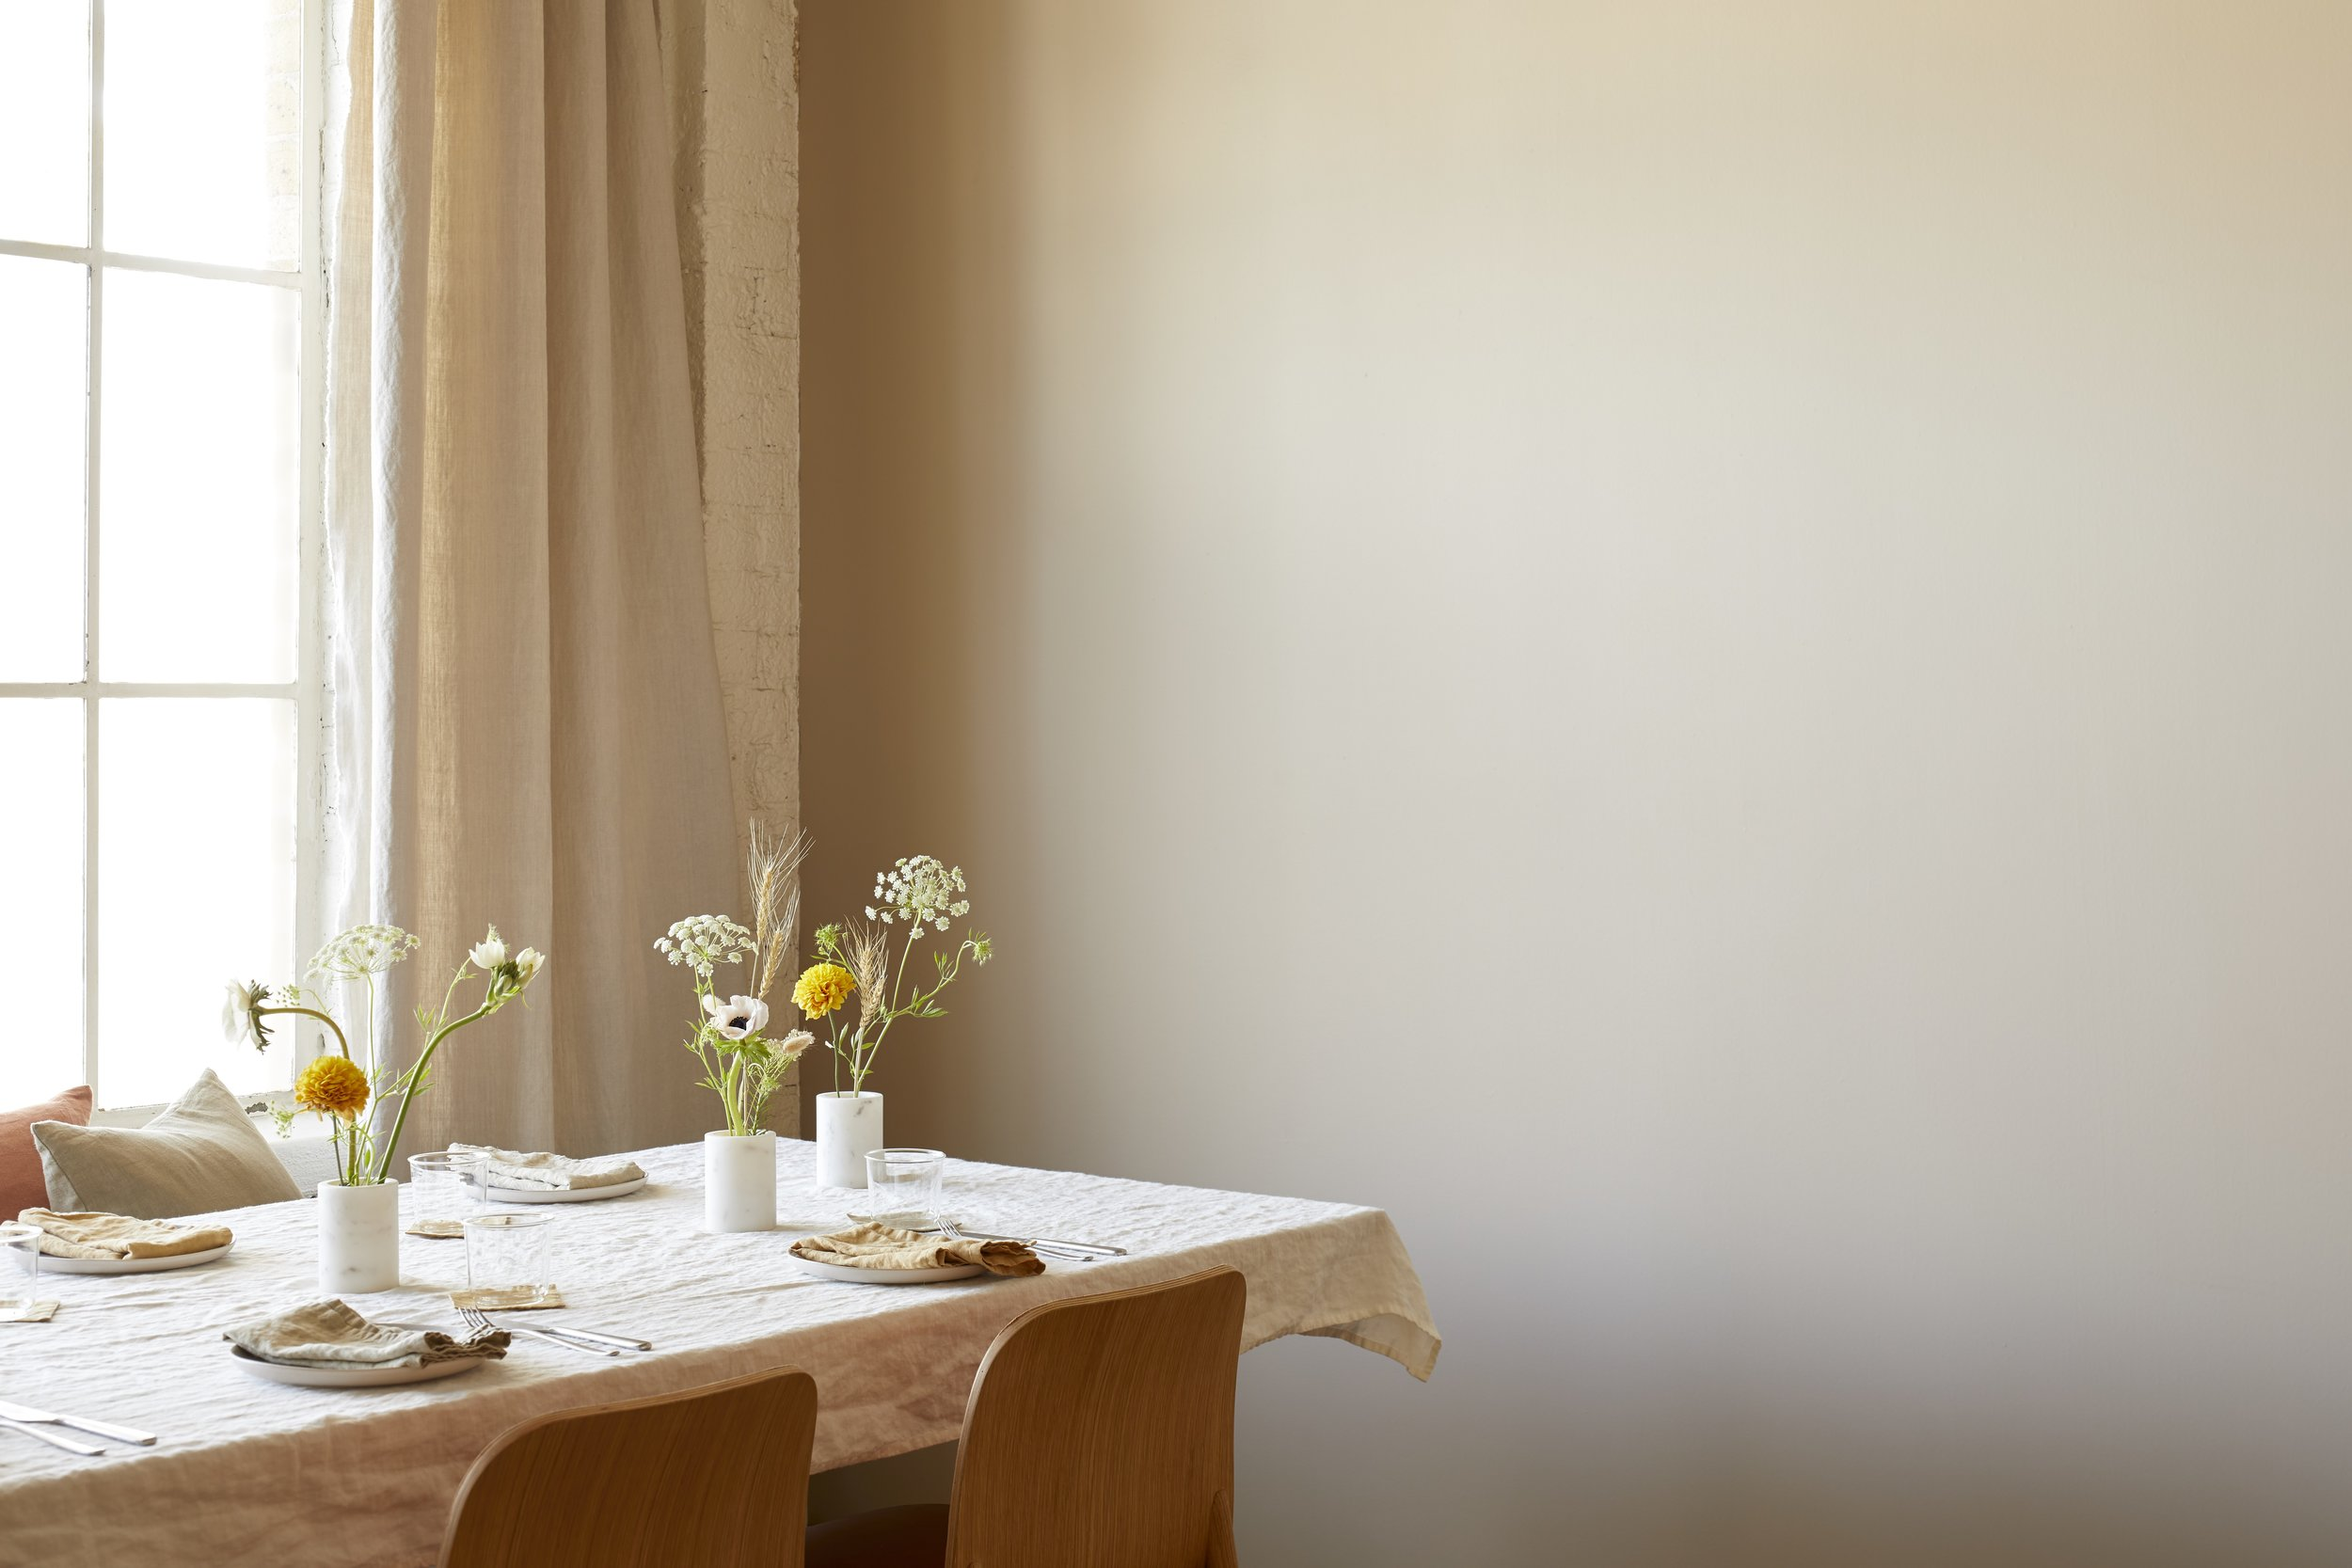 SYS.Dining.226.jpg